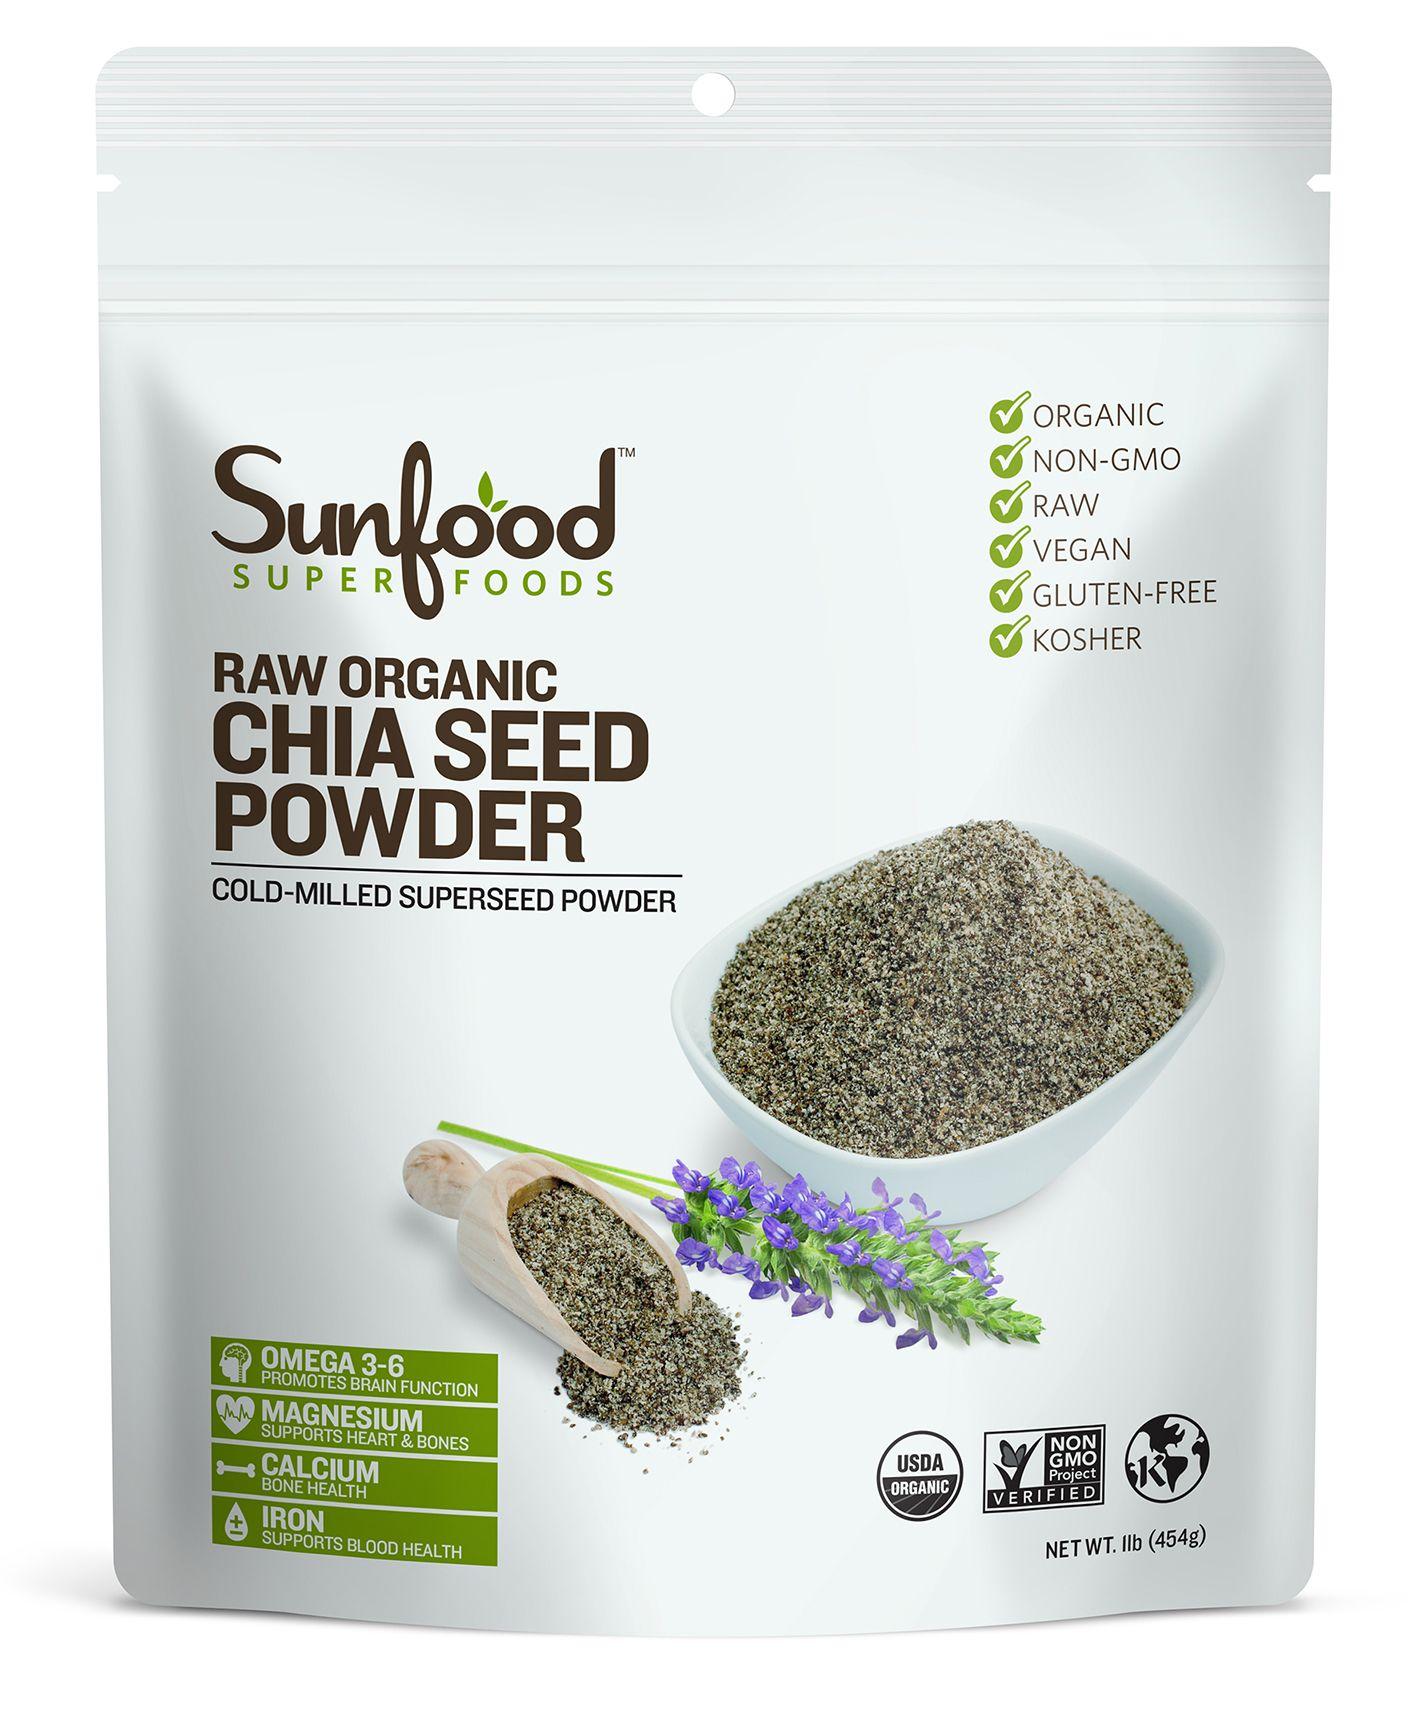 Sunfood Superfoods Organic Chia Seed Powder, 1.0 Lb